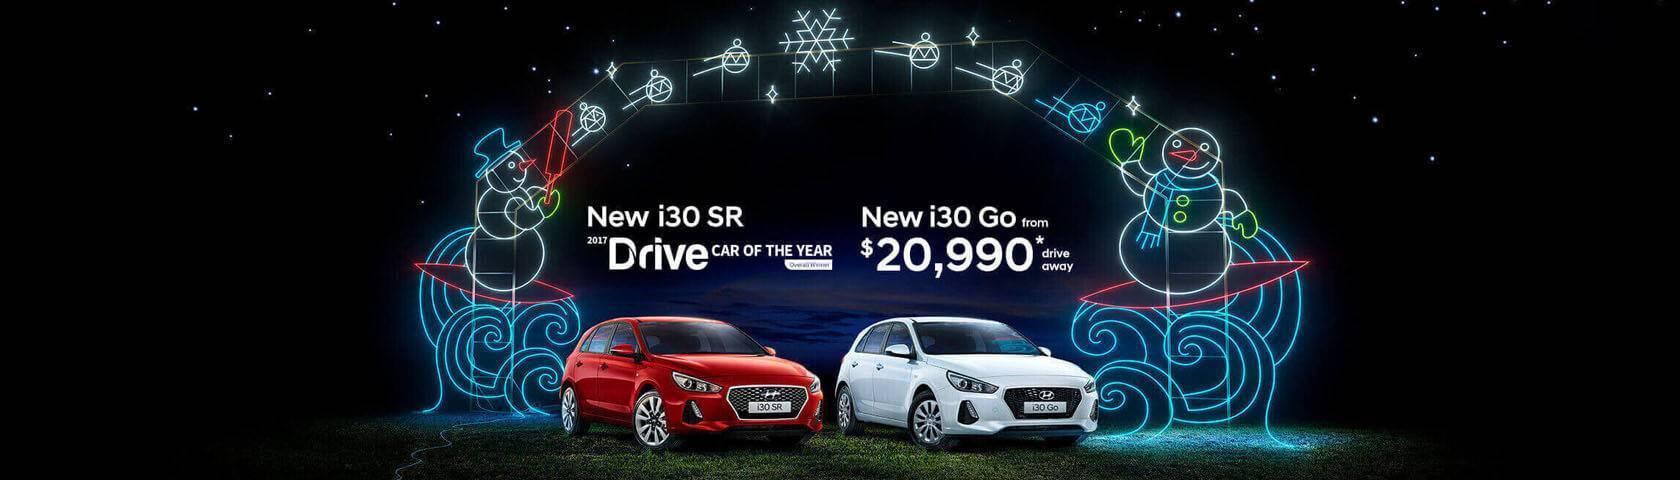 Hyundai Dealer Offers